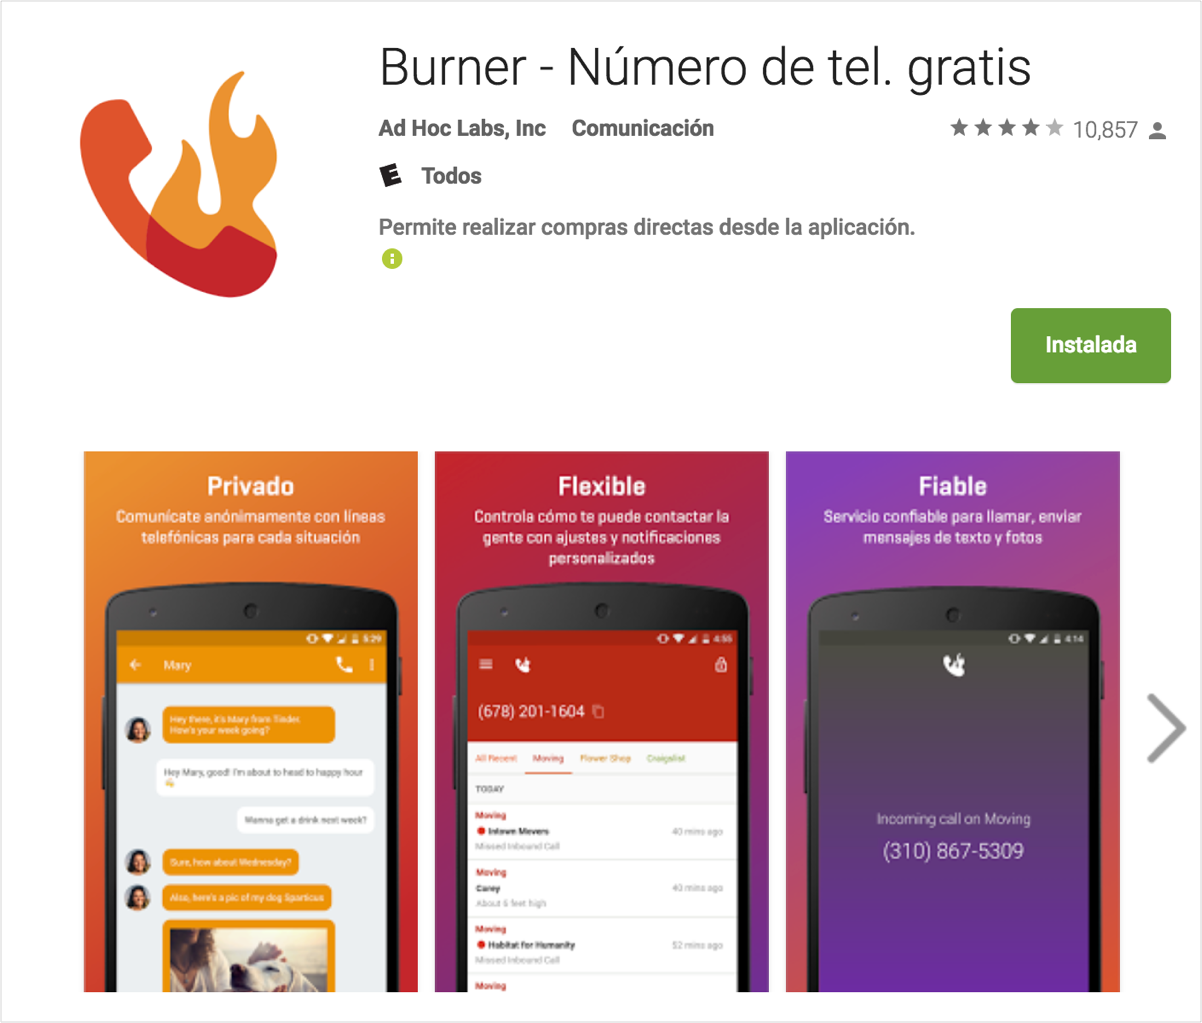 Burner on Google Play